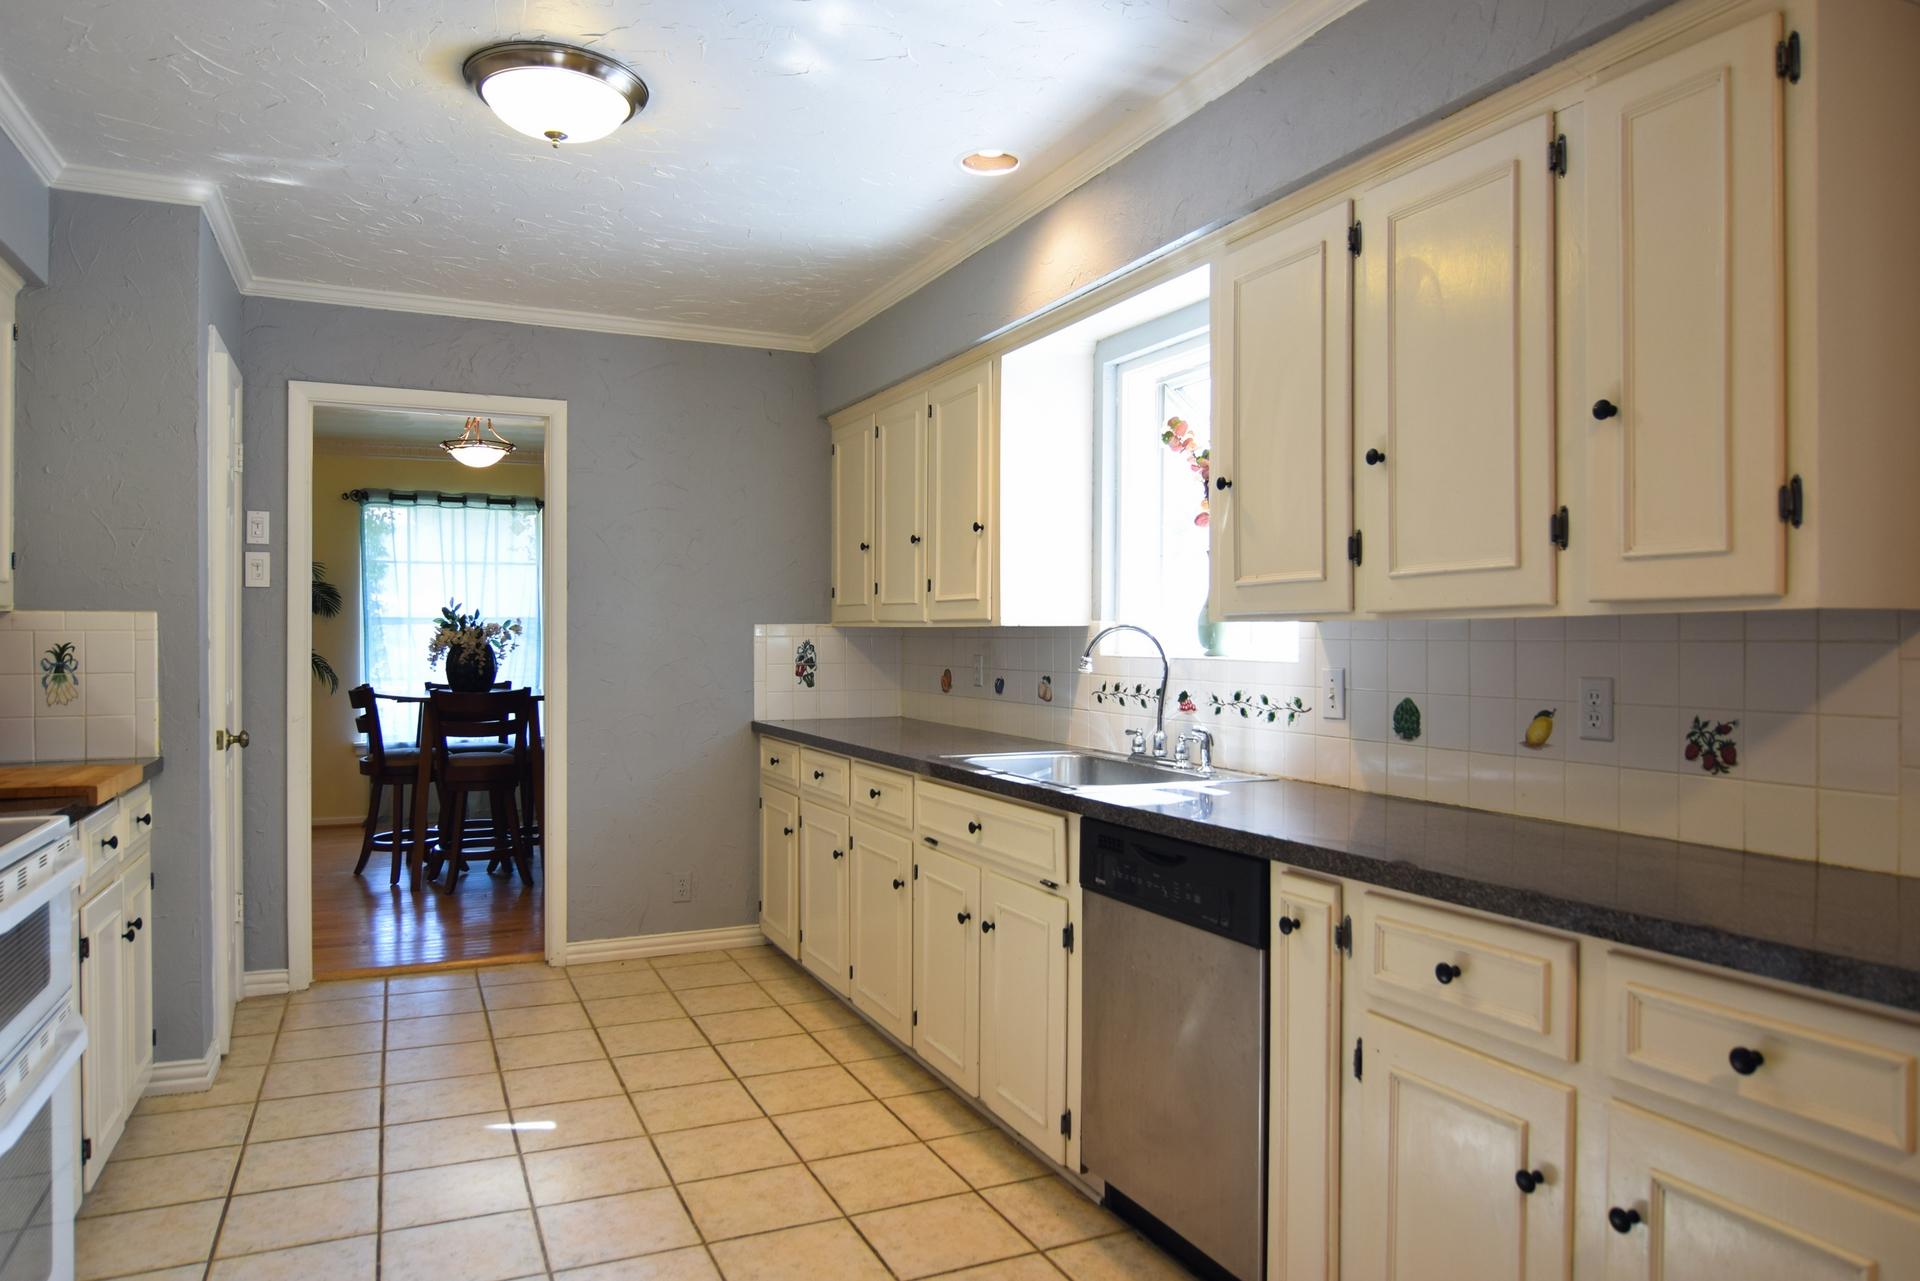 Kitchen Prep Area 3235 Timberview Rd Dallas TX 75229.jpg